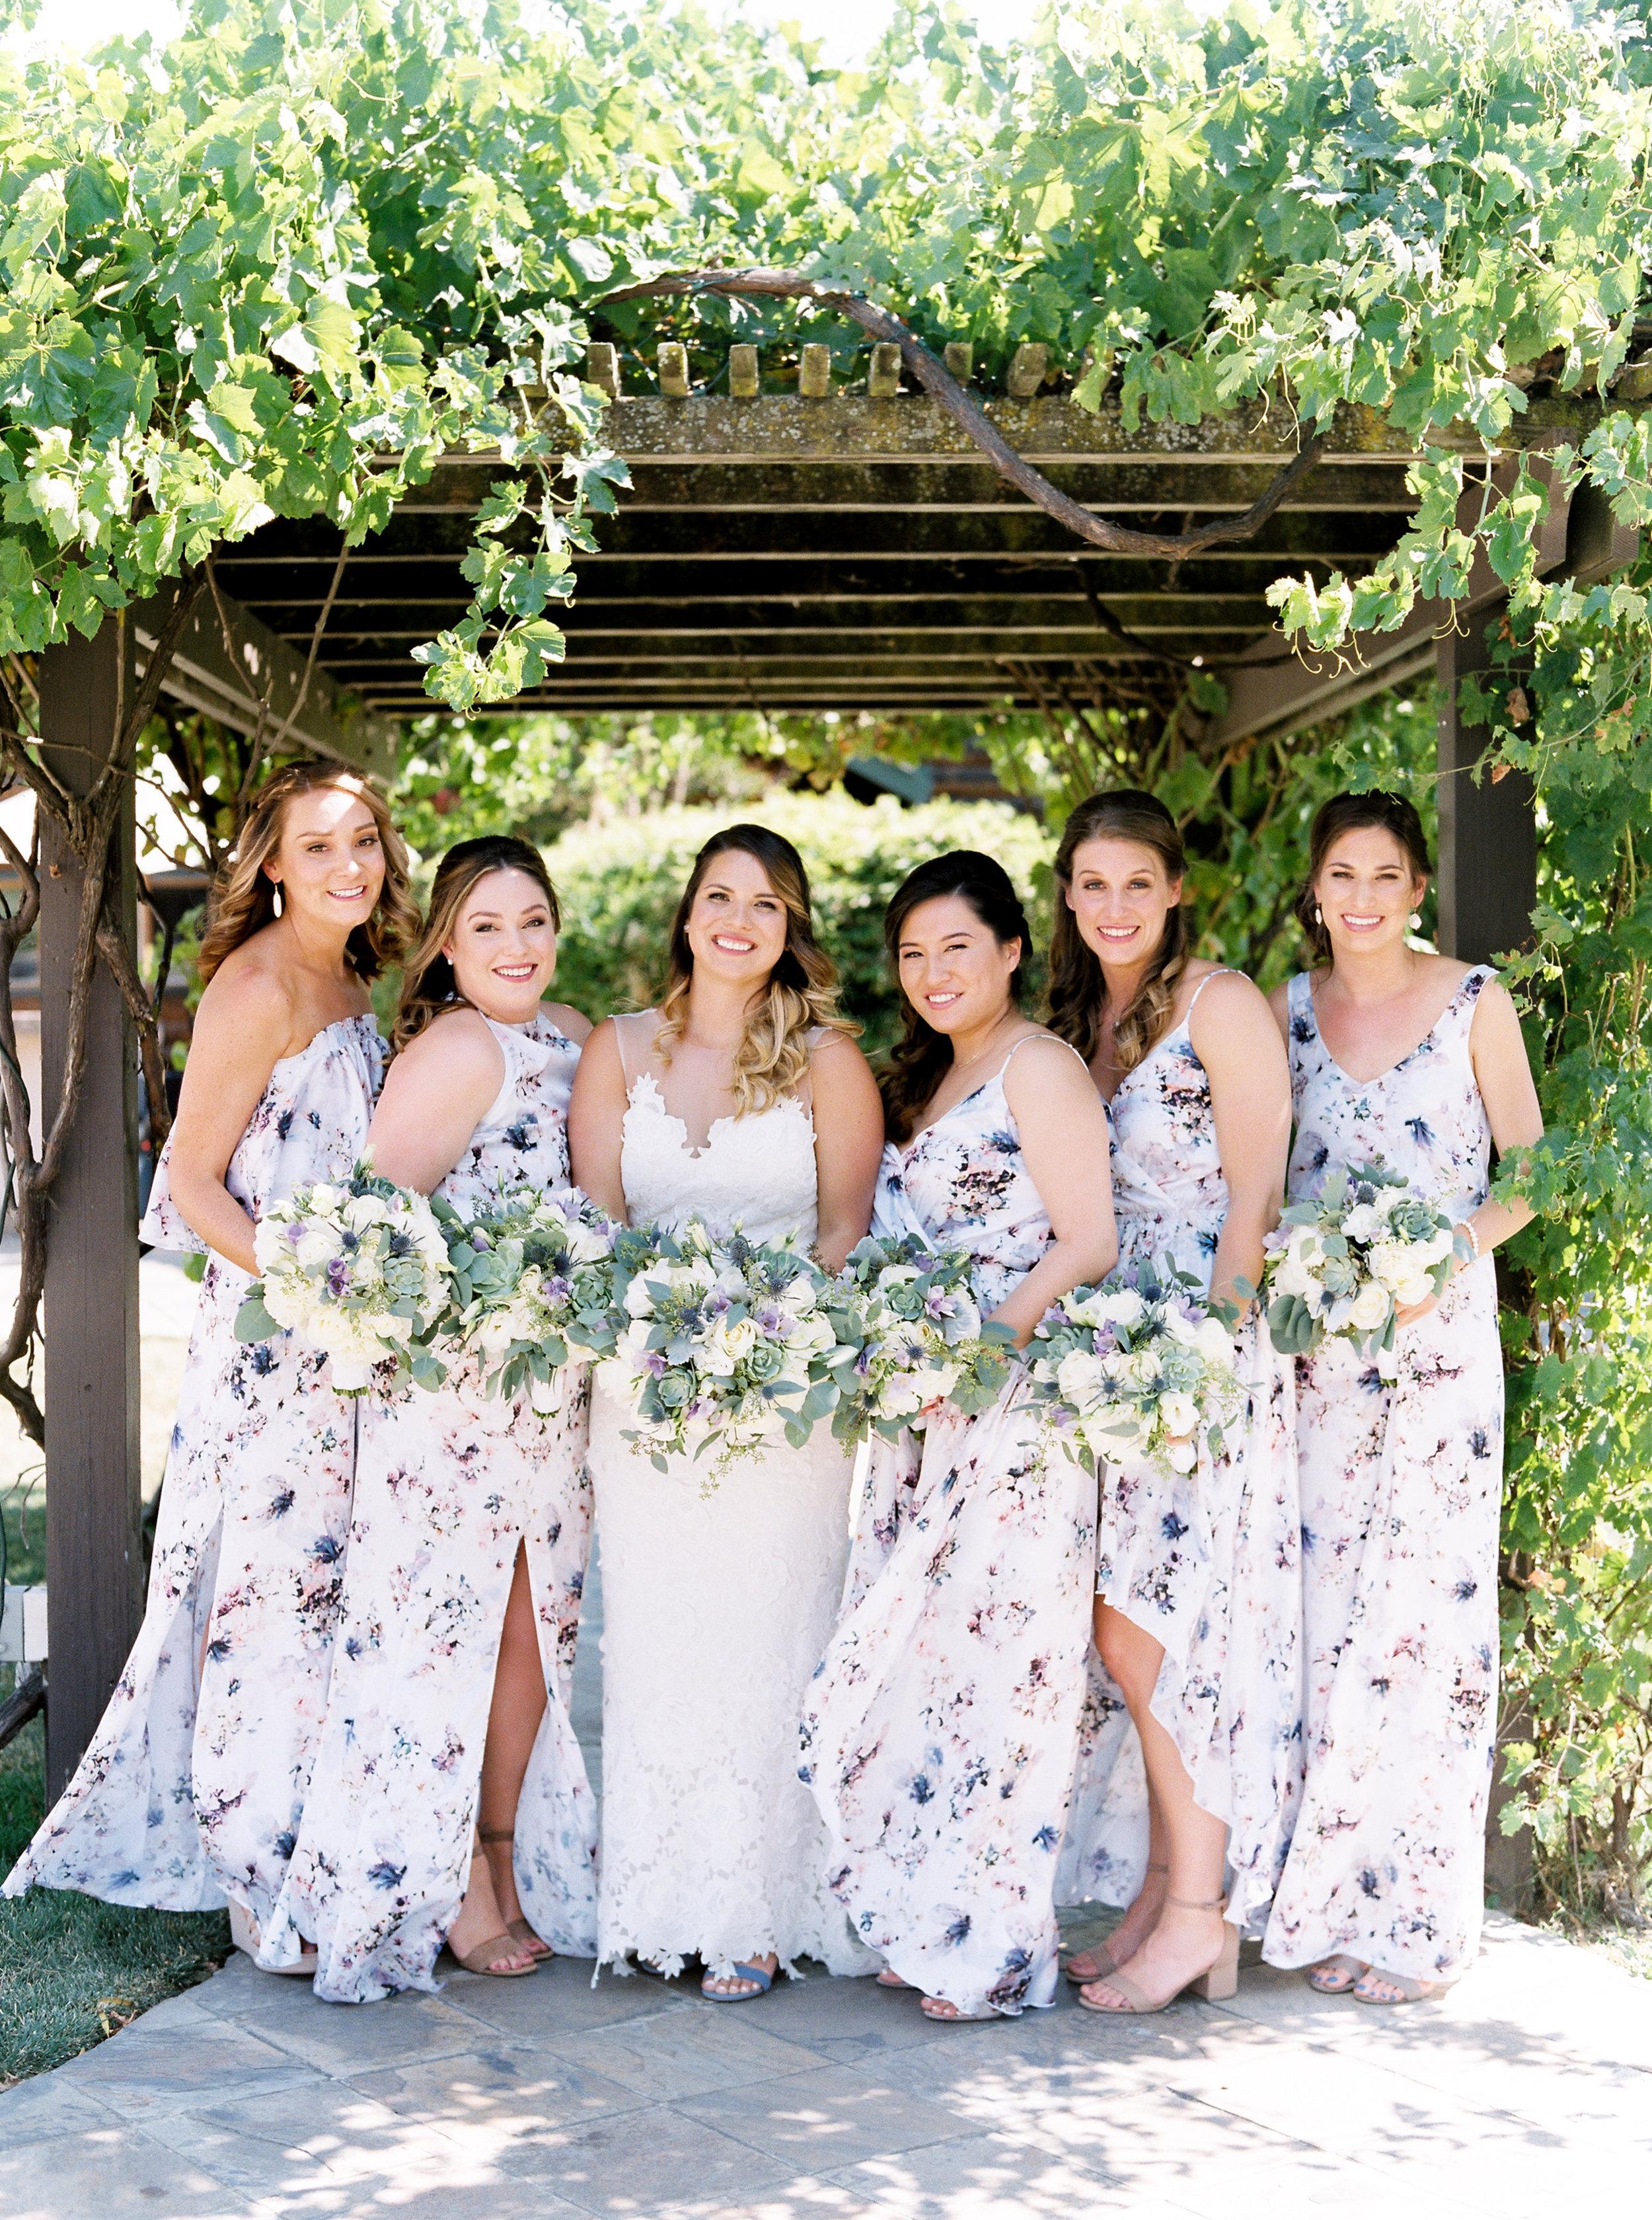 the-purple-orchid-resort-wedding-in-livermore-california-204.jpg